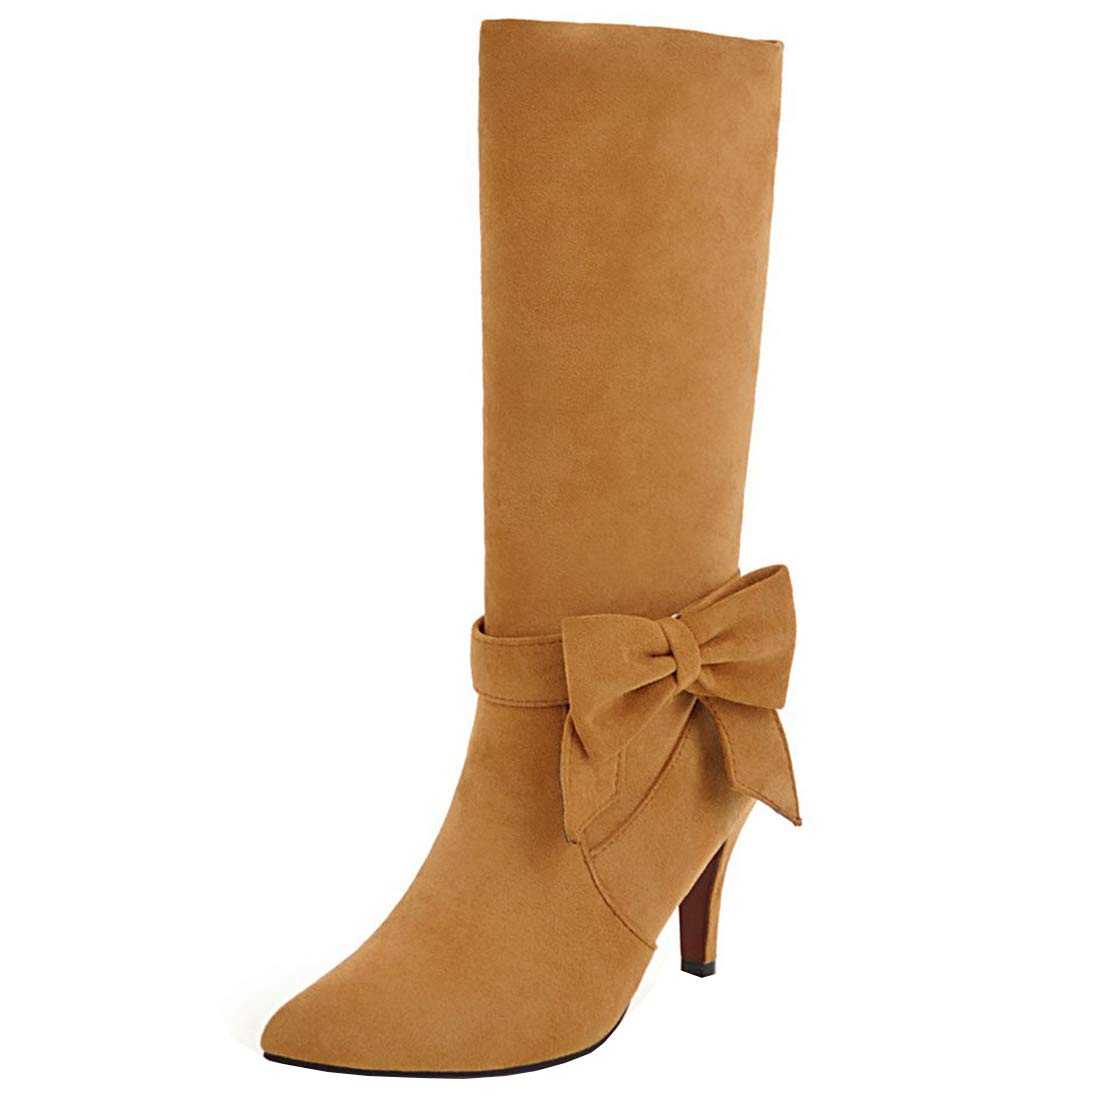 YE Rockabilly Chaussure Sweet Longue Botte Mi Mollet Stretch Jaune Fourrure 18272 Femme Bout Pointu Talon Haut Aiguille avec Noeud Rockabilly Jaune 9e11270 - reprogrammed.space